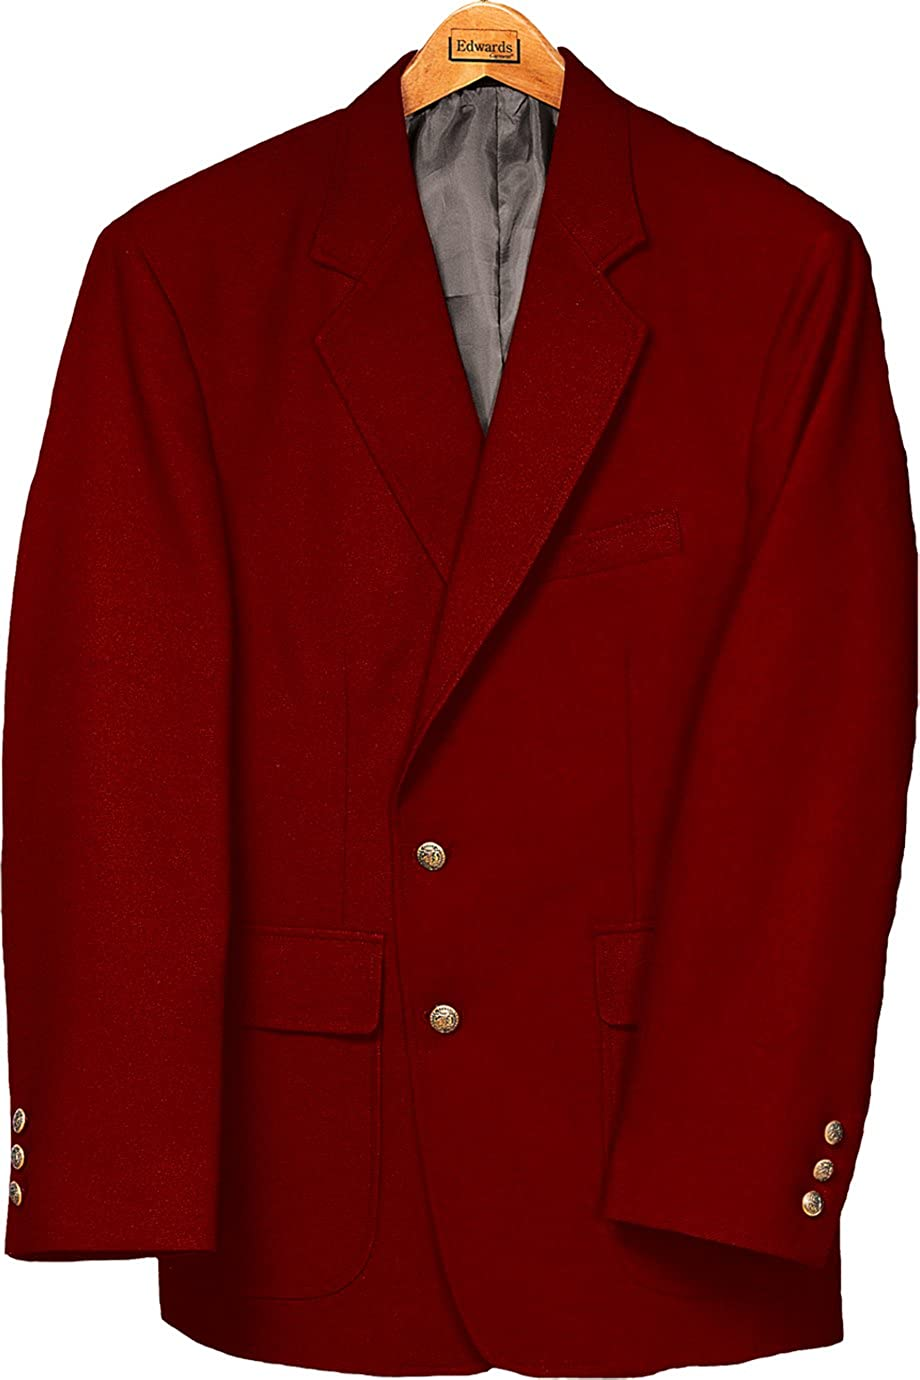 Edwards Men's Value Poly Blazer, RED, 46